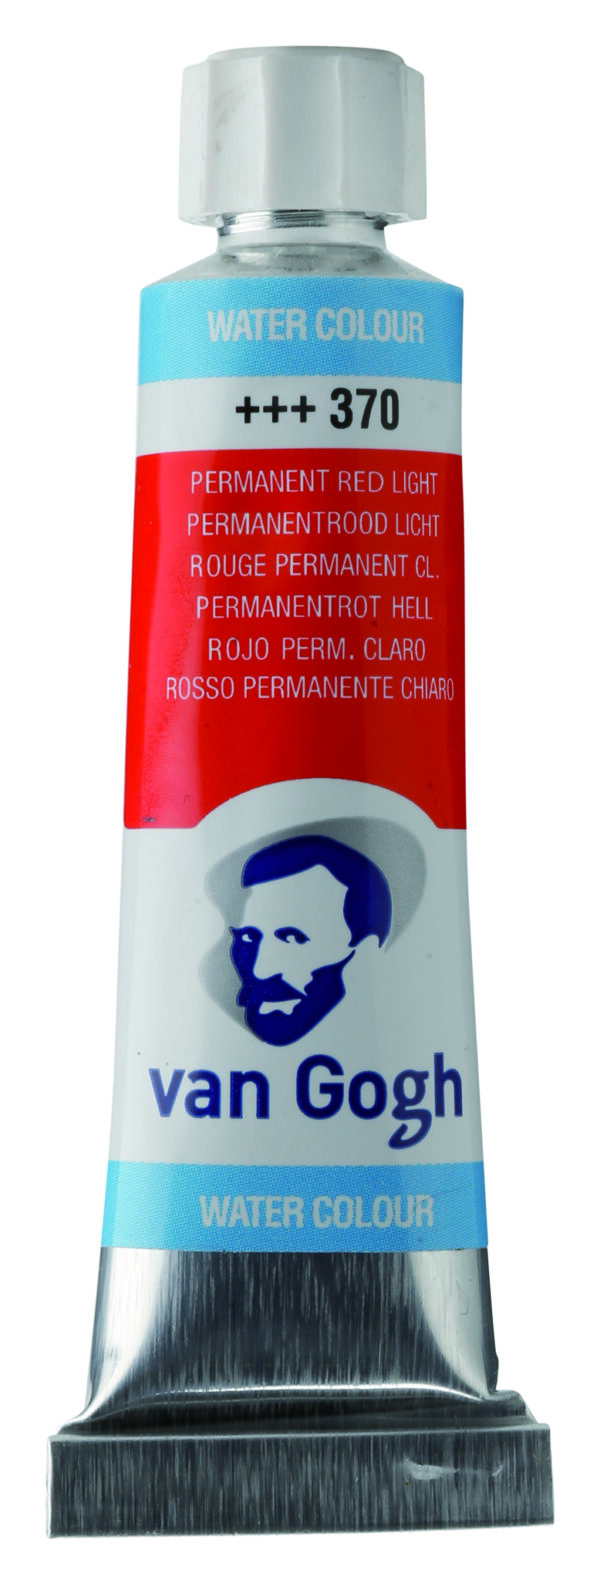 Van Gogh 370 Permanent red Light - 10 ml